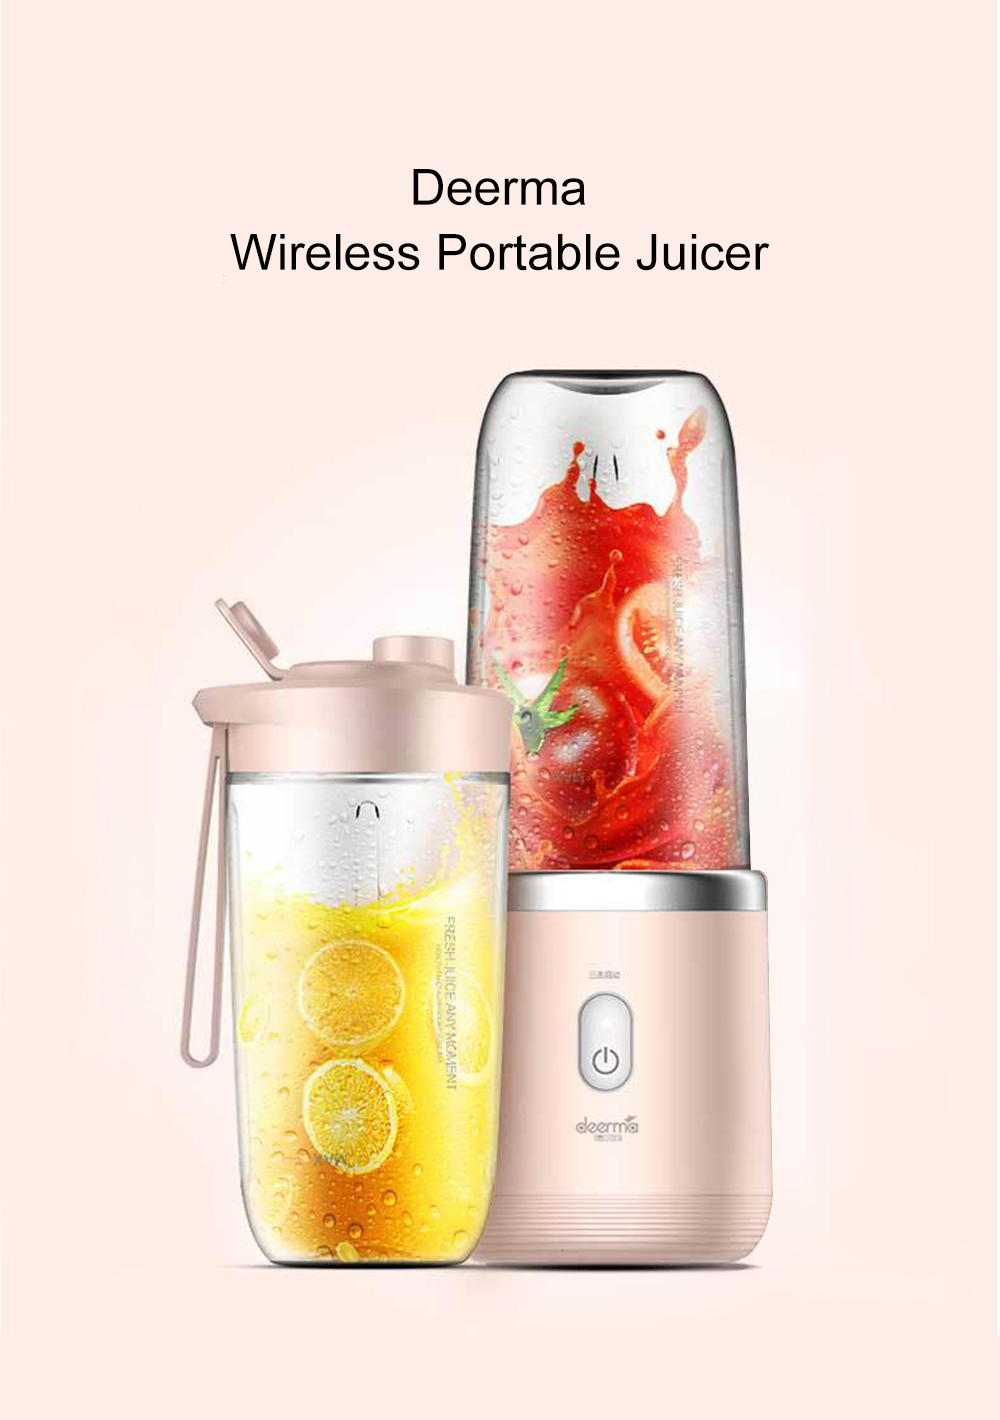 H2637ecb62c8945559f9abb3fea9bdb3bV Xiaomi Deerma Portable Blender Electric Juicer 400ML Wireless Automatic Multipurpose USB Rechargable Mini Juice Cup Cut Mixer